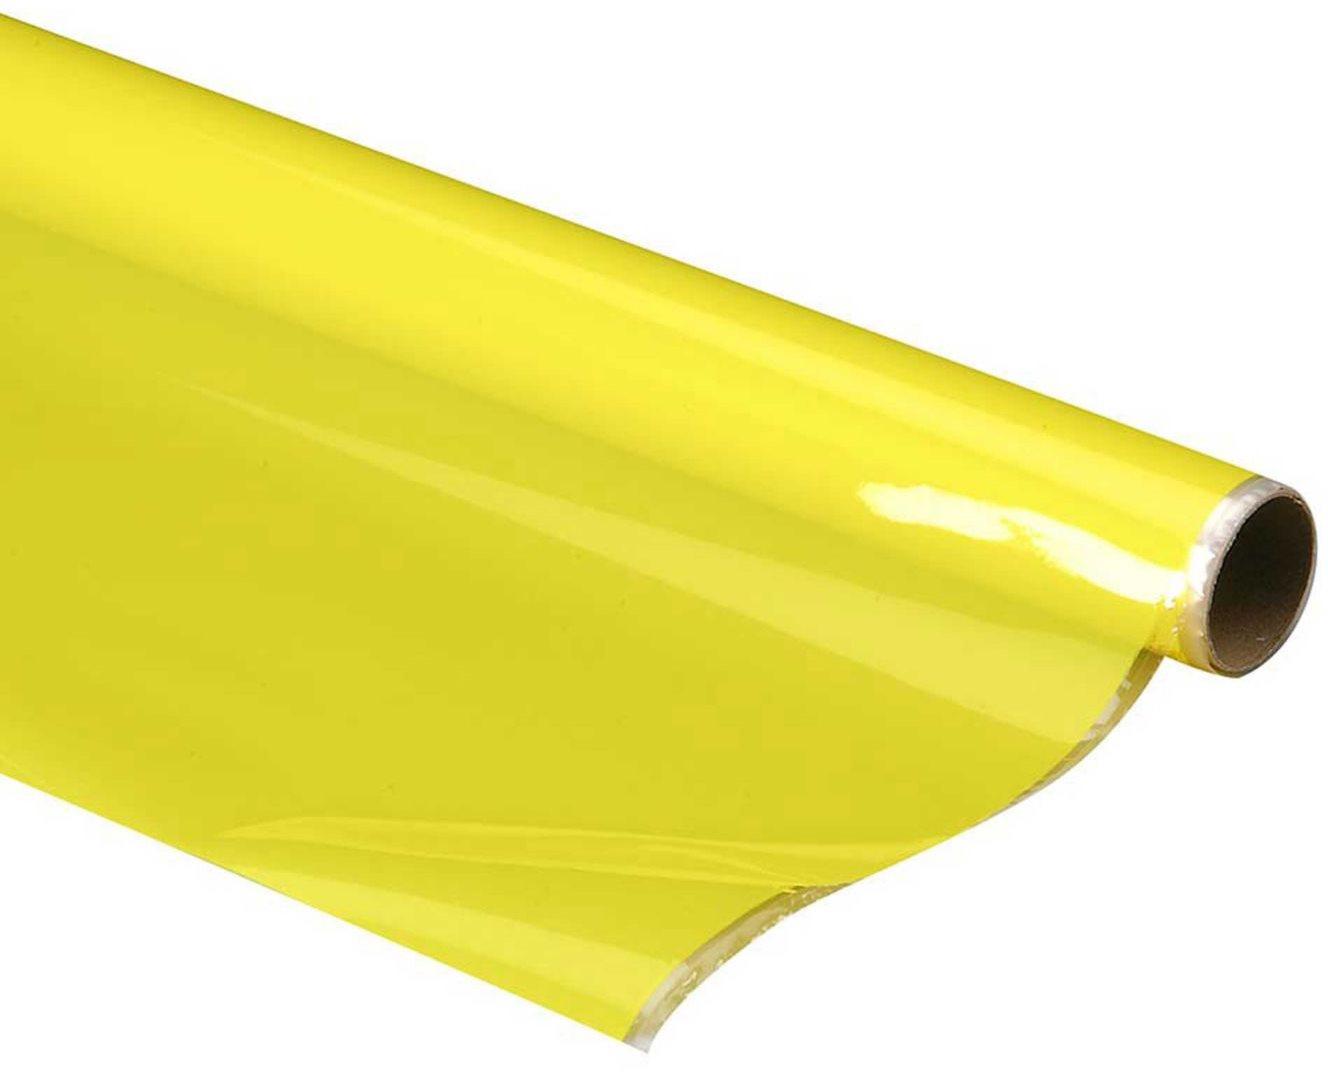 Top Flite MonoKote Transparent Yellow 6\'